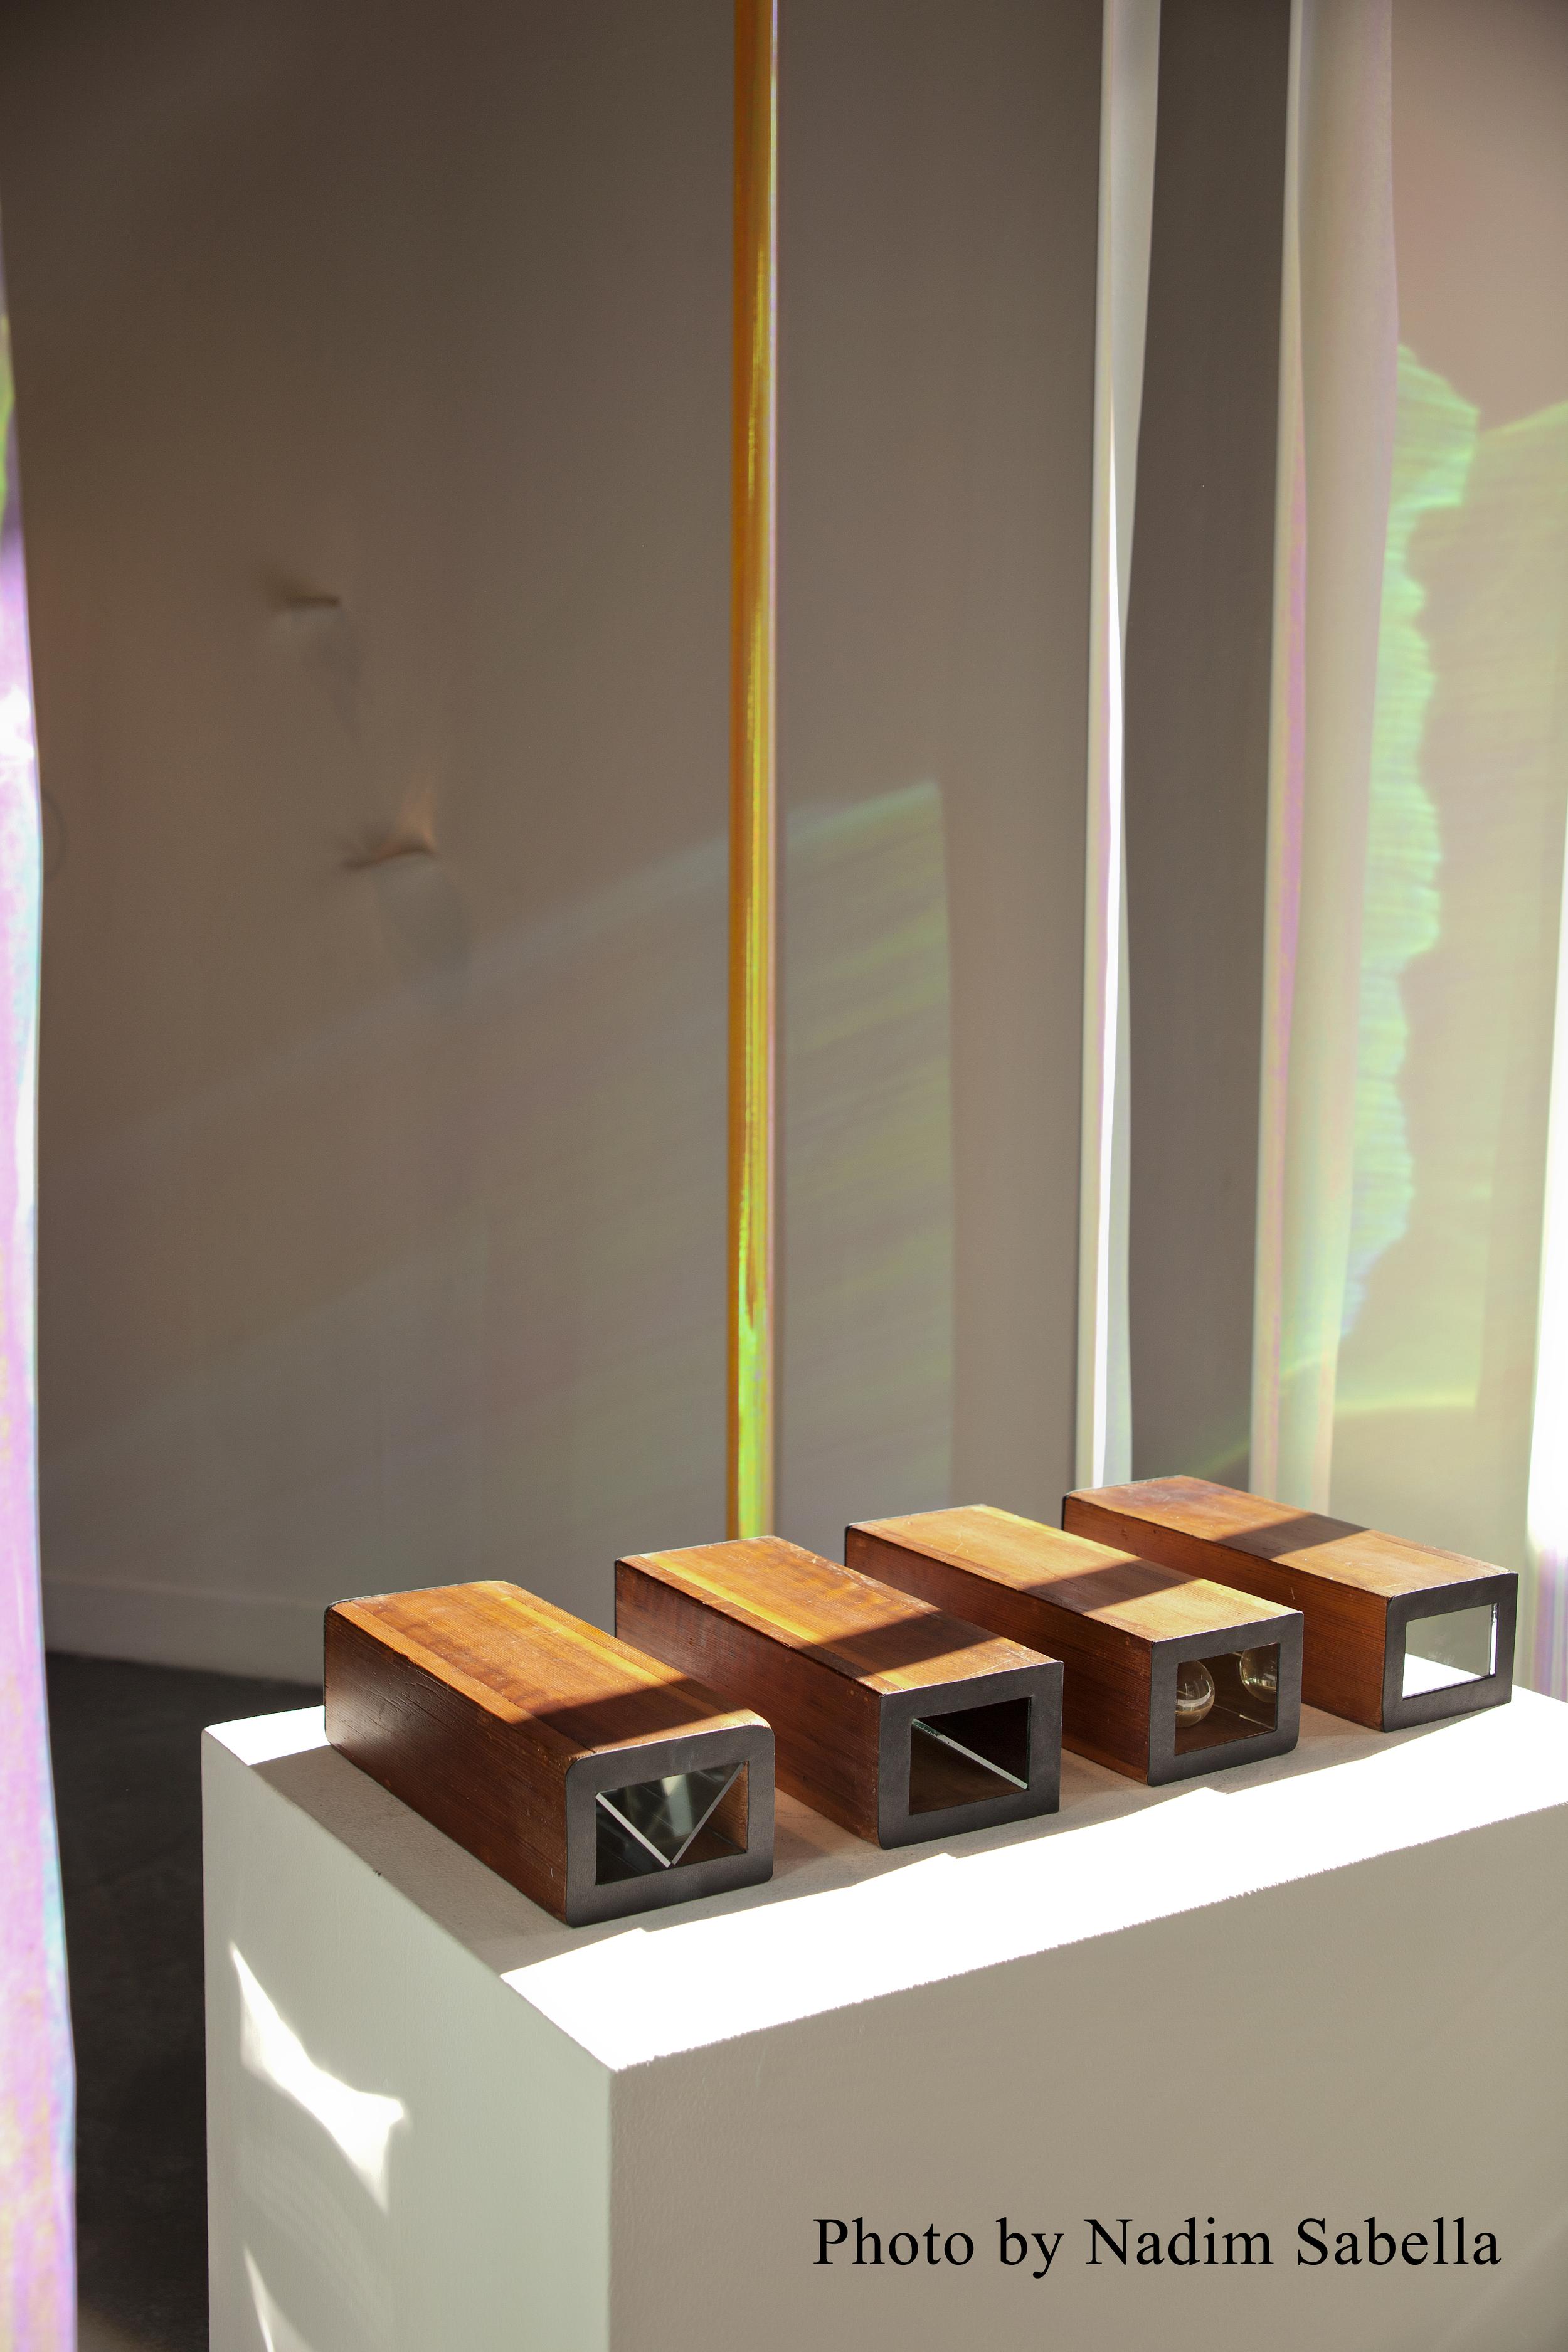 Ali Nashke Messing Installation Shots Edited 5.jpg